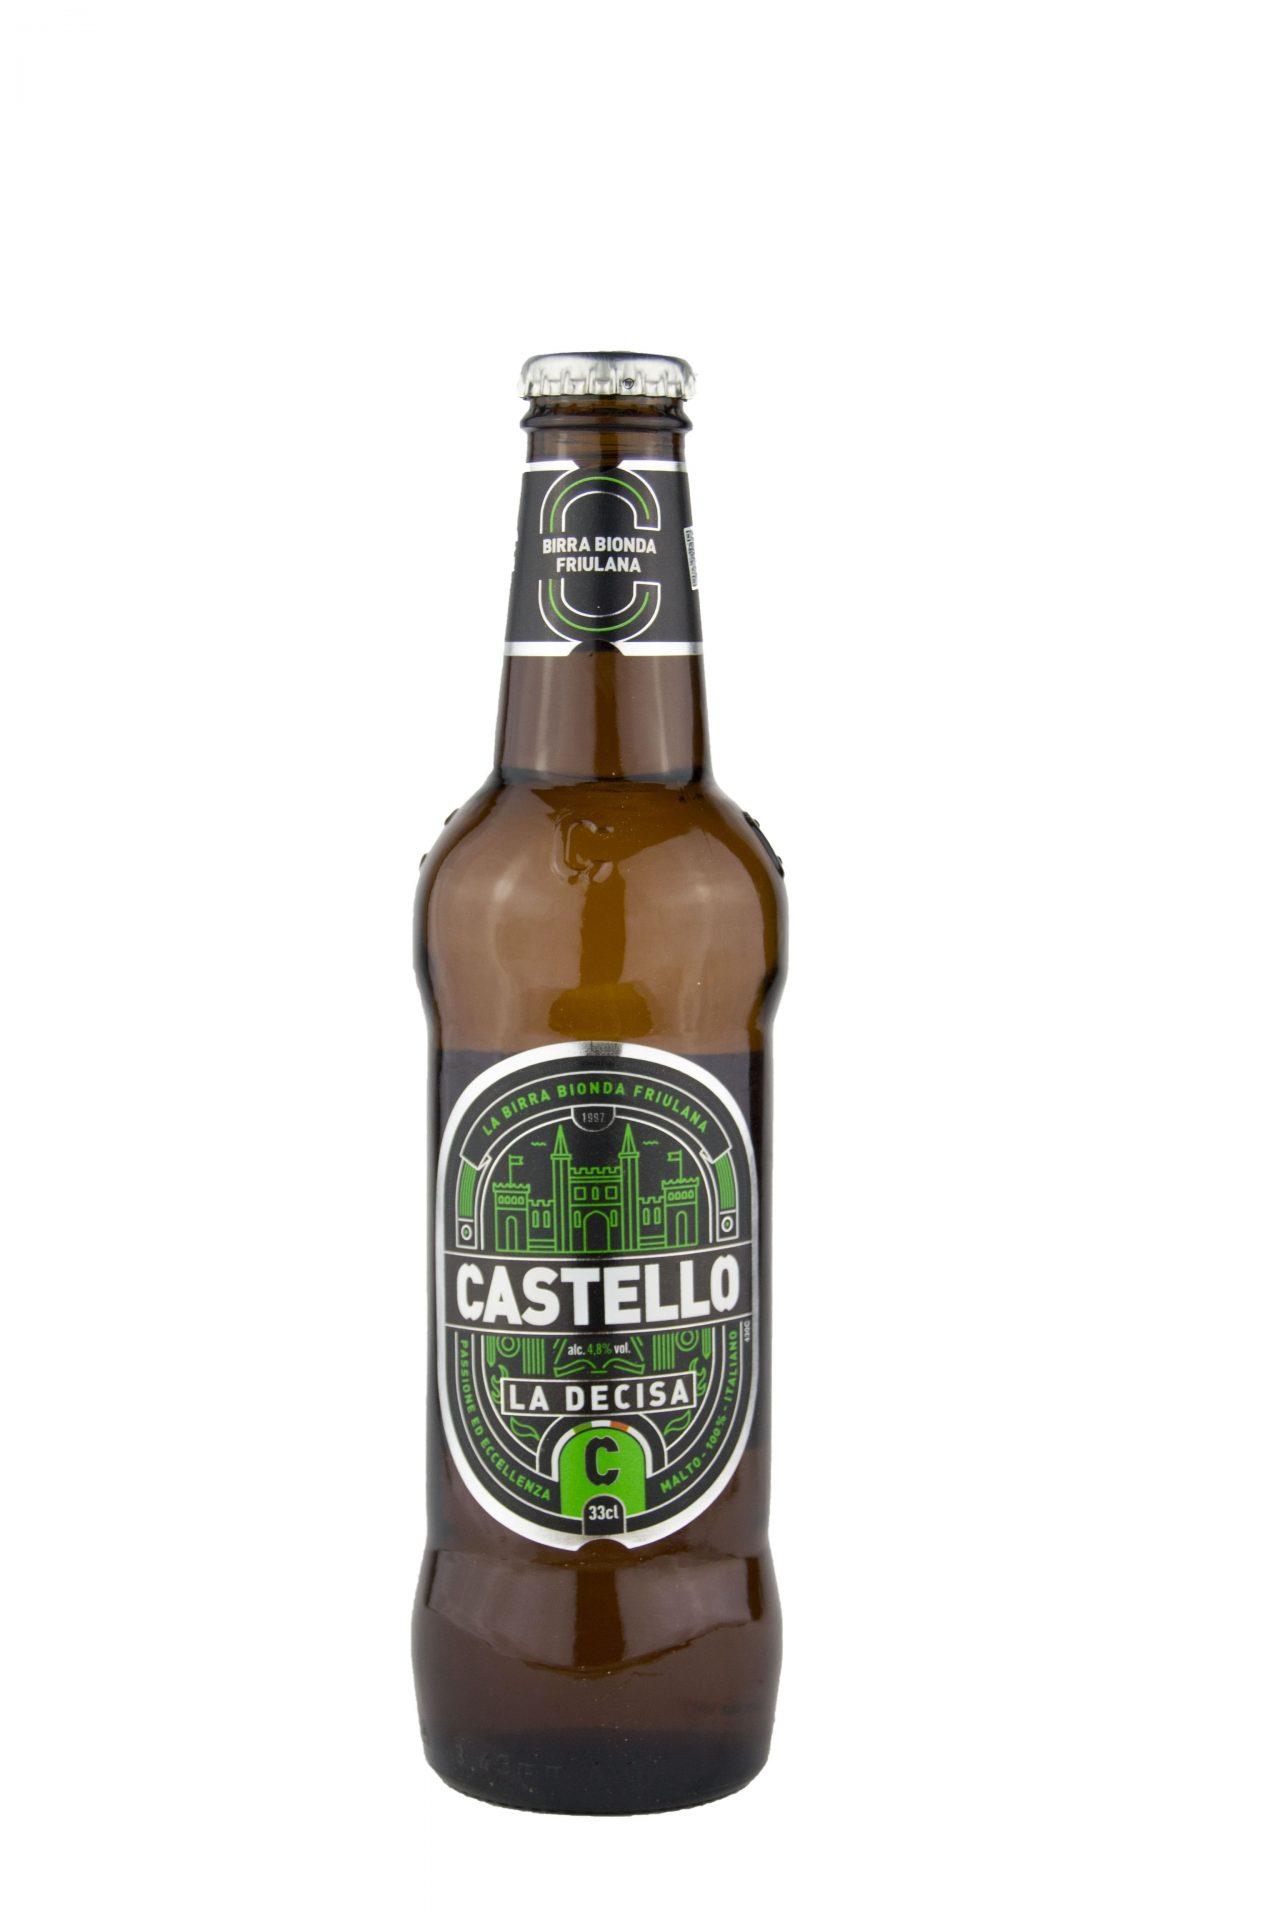 Castello – La Decisa